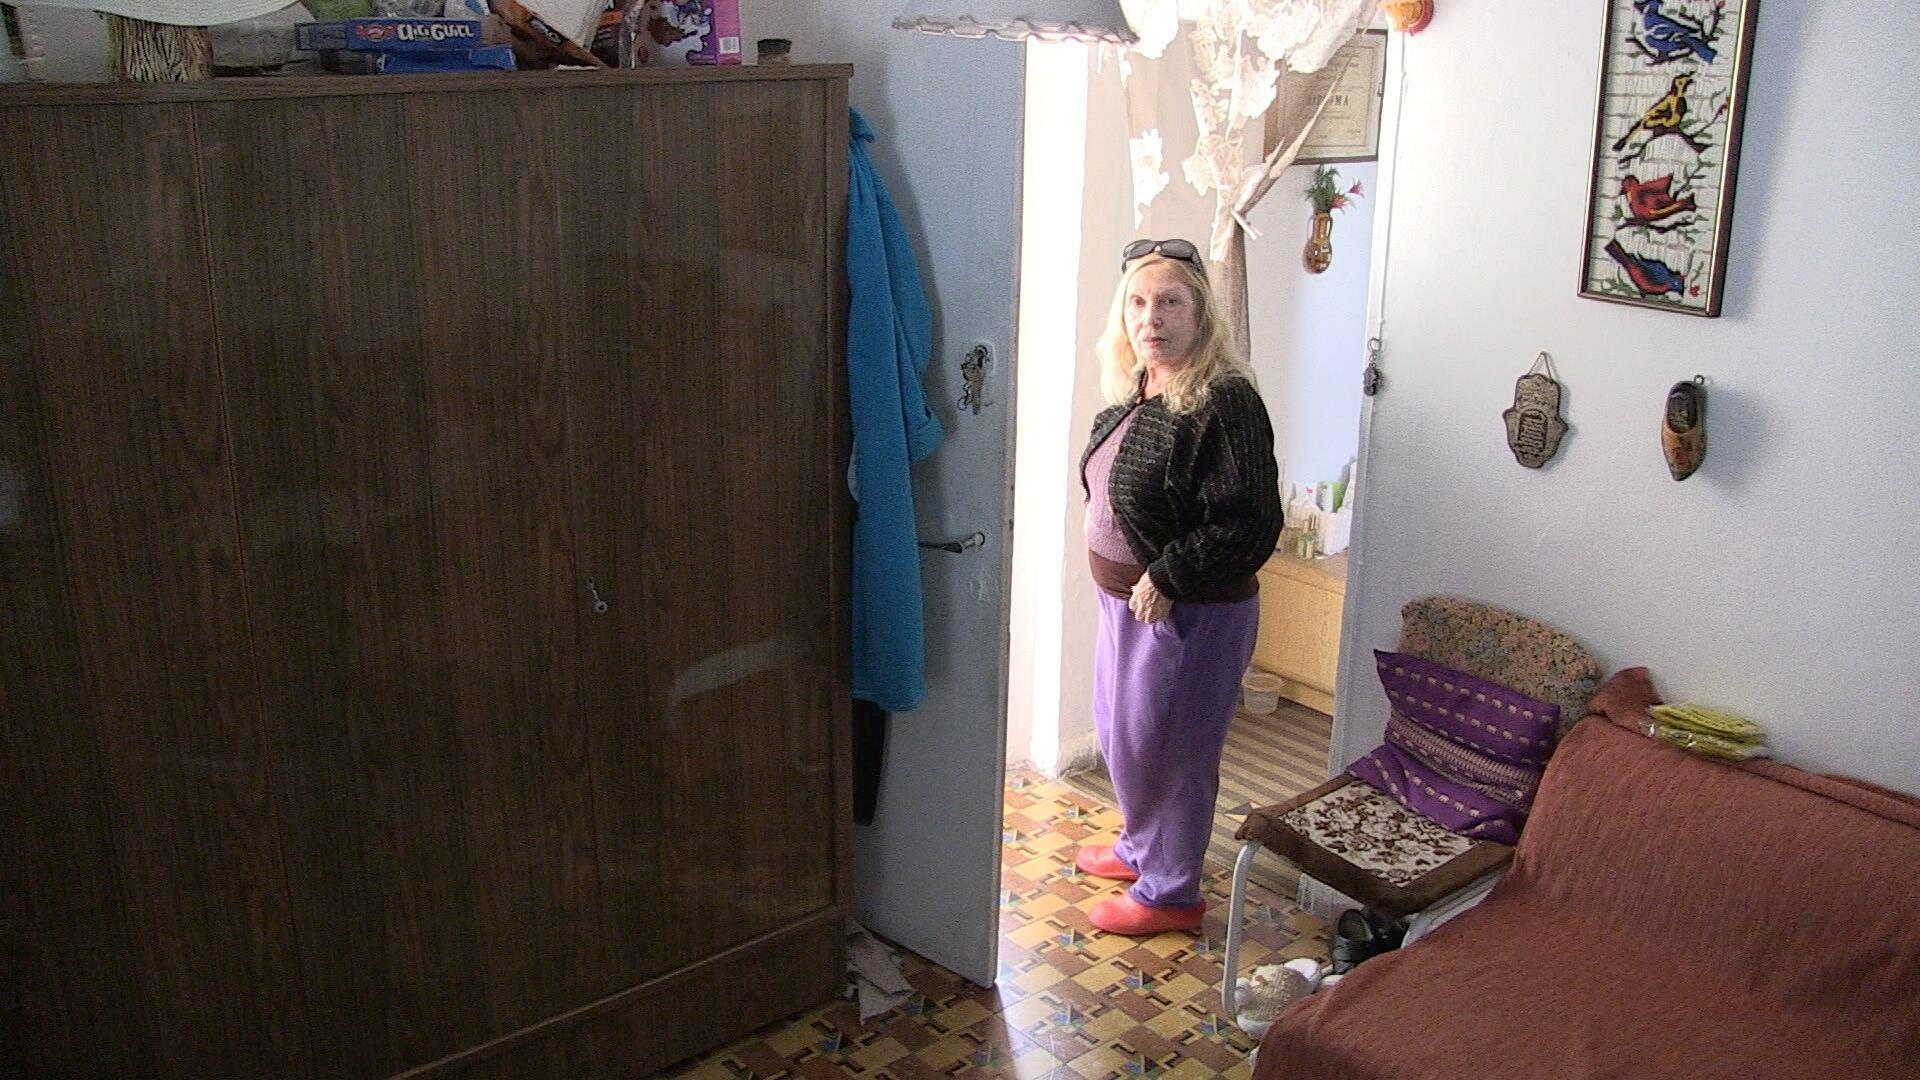 Hadasa Hershcovichi at her Tel Aviv home in January 2015